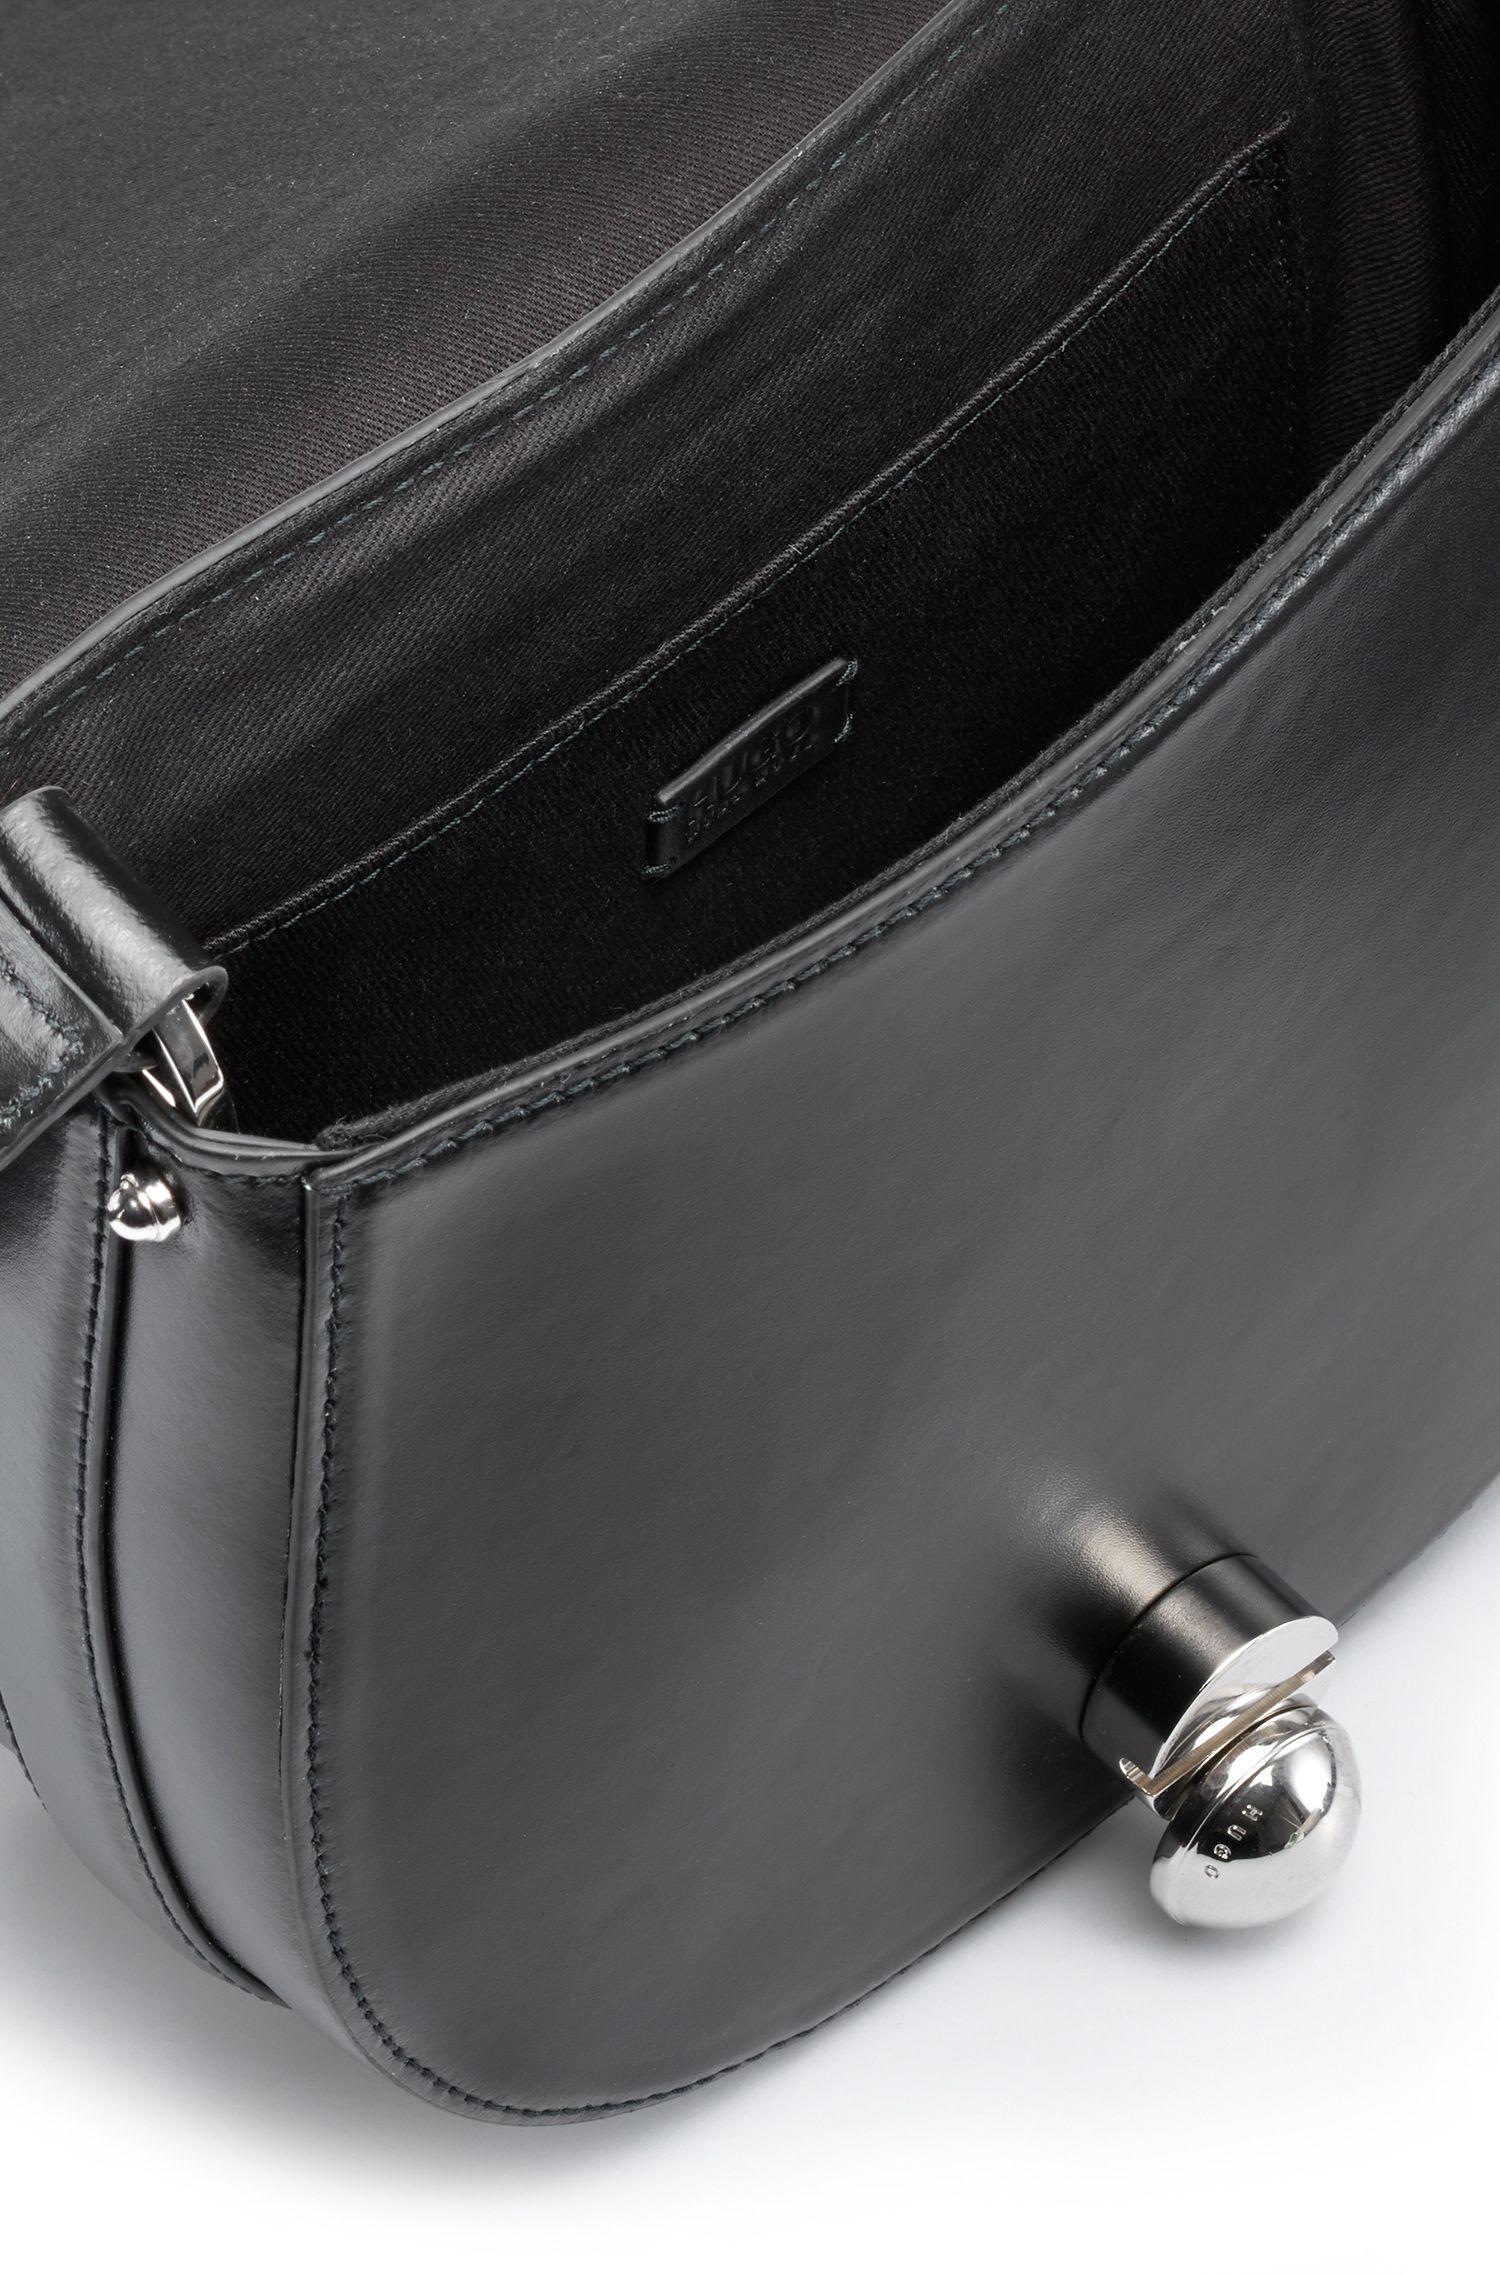 Besace en cuir lisse avec garniture polie